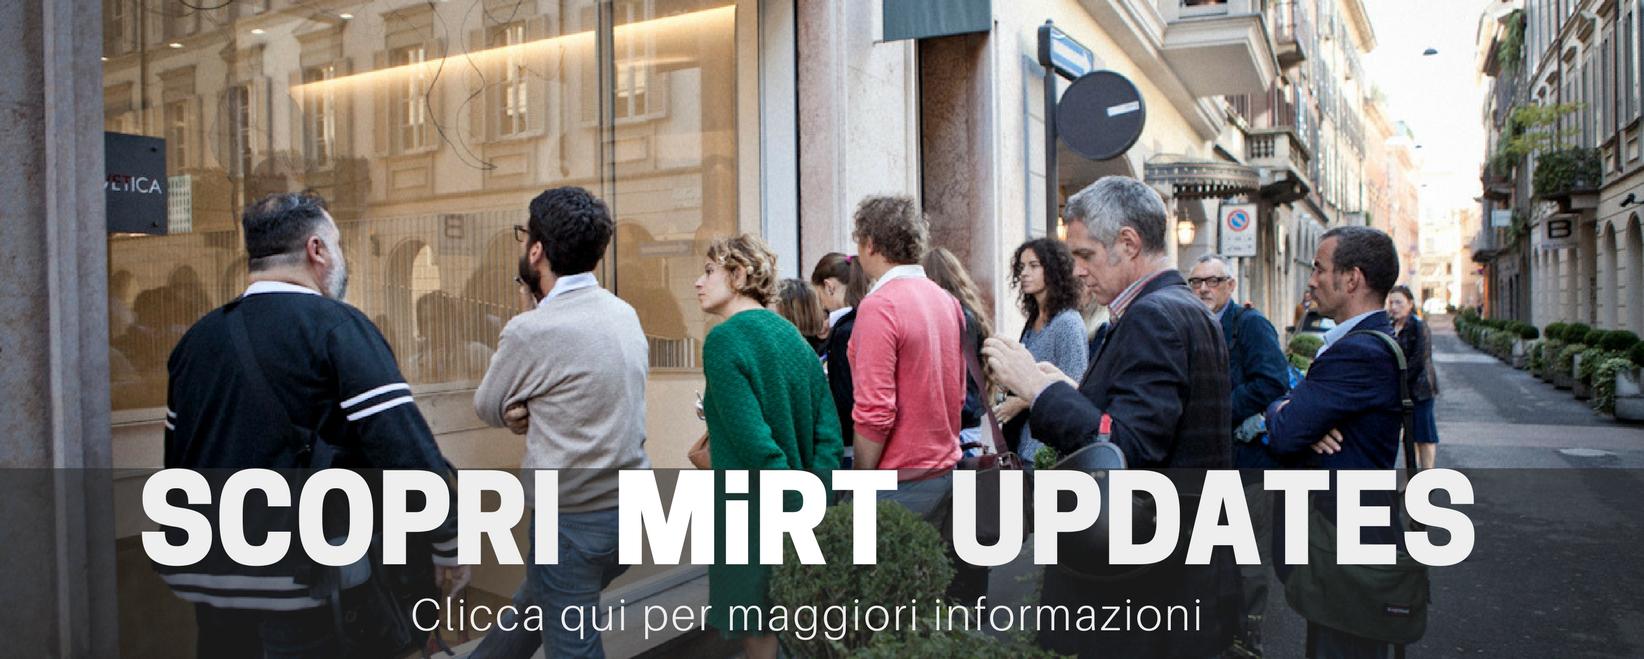 Scopri MiRT Updates per sito mirt